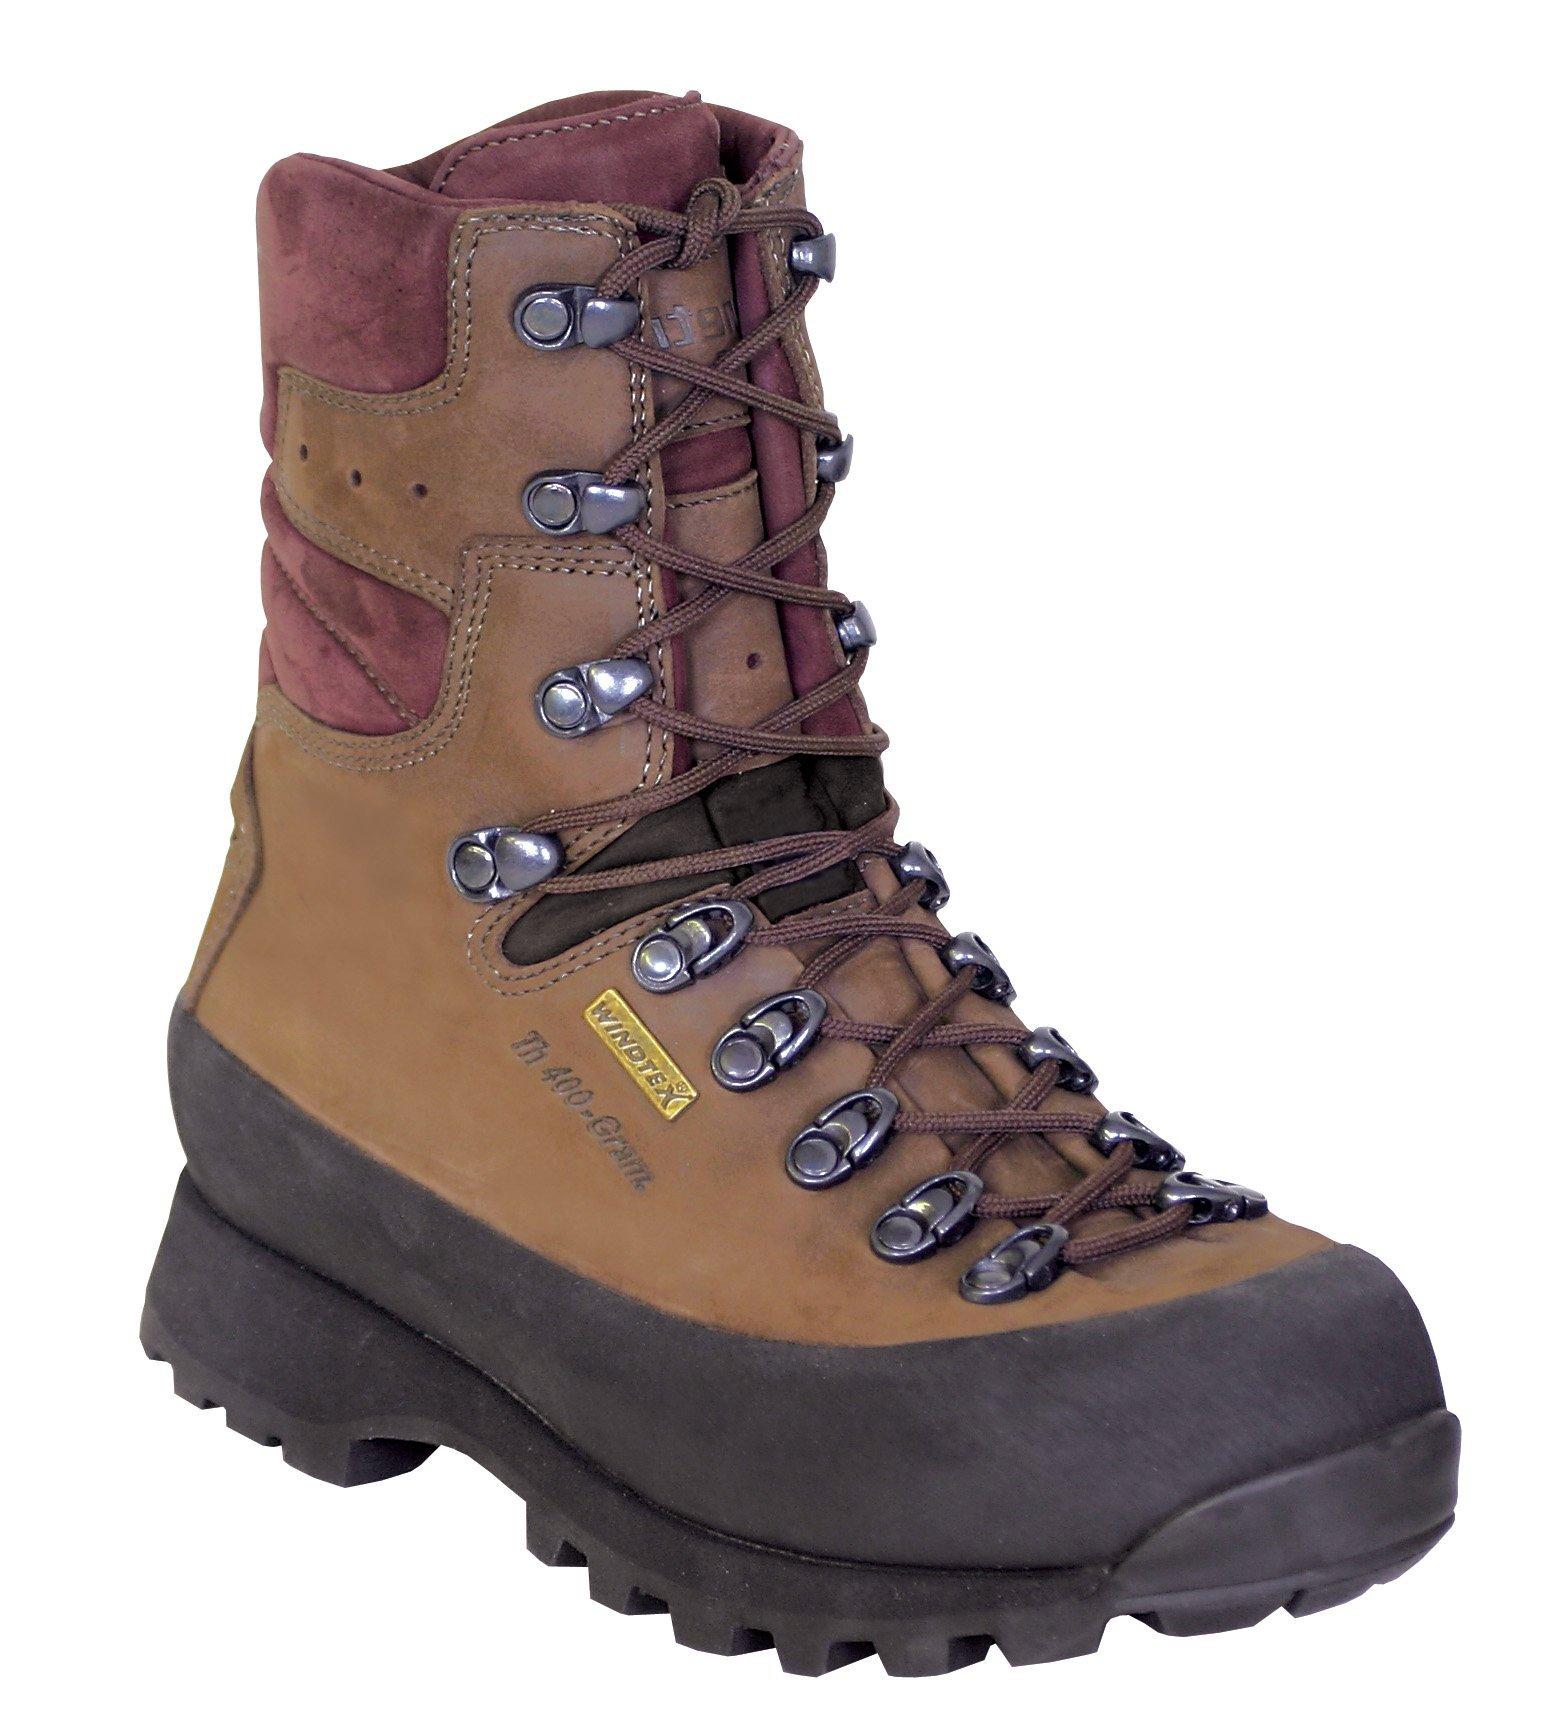 Kenetrek Women's Women's Mountain Extreme Insulated Hunting Boot,Brown,6 M US